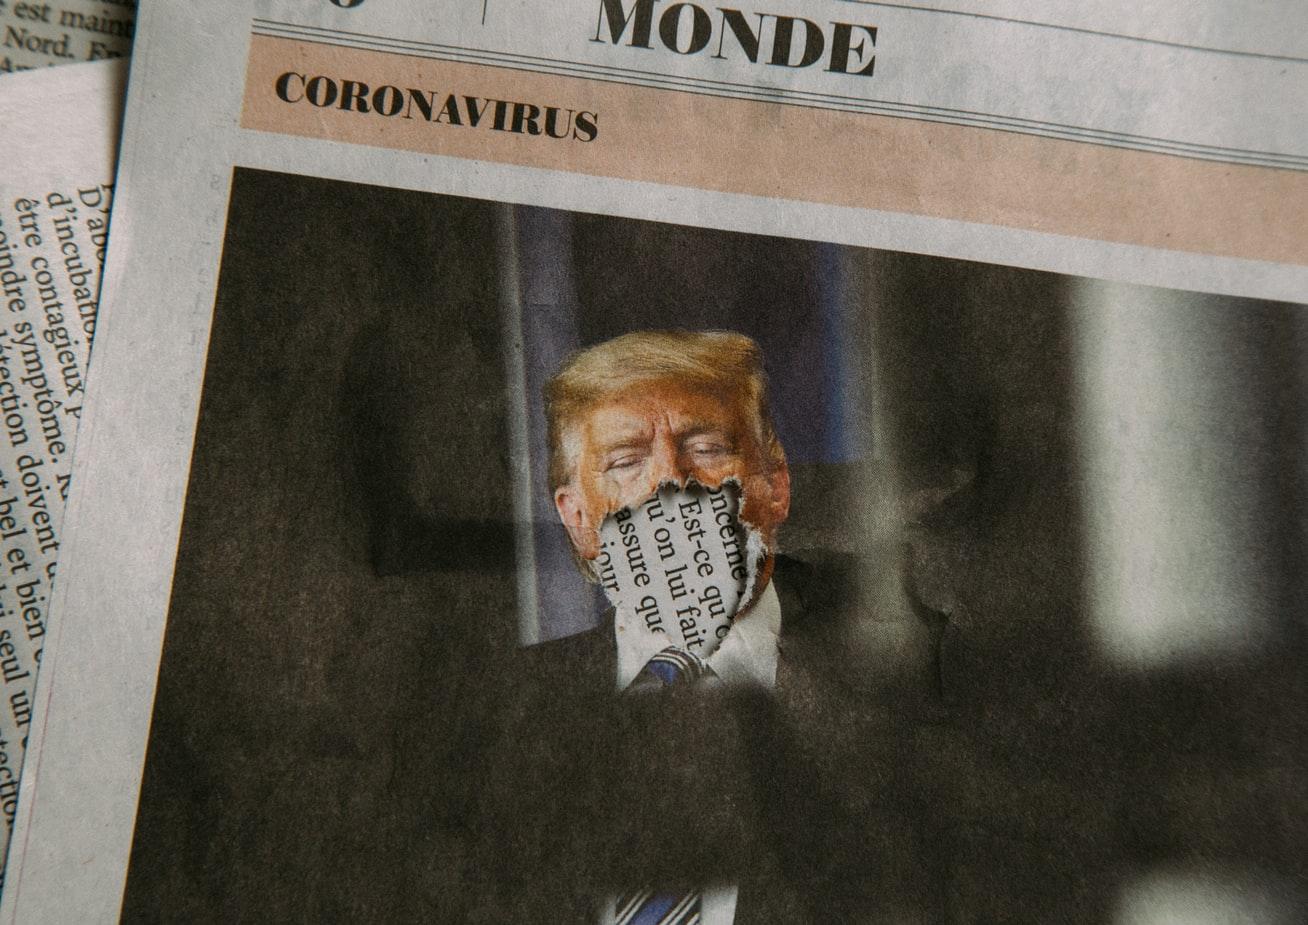 unfollow Trump